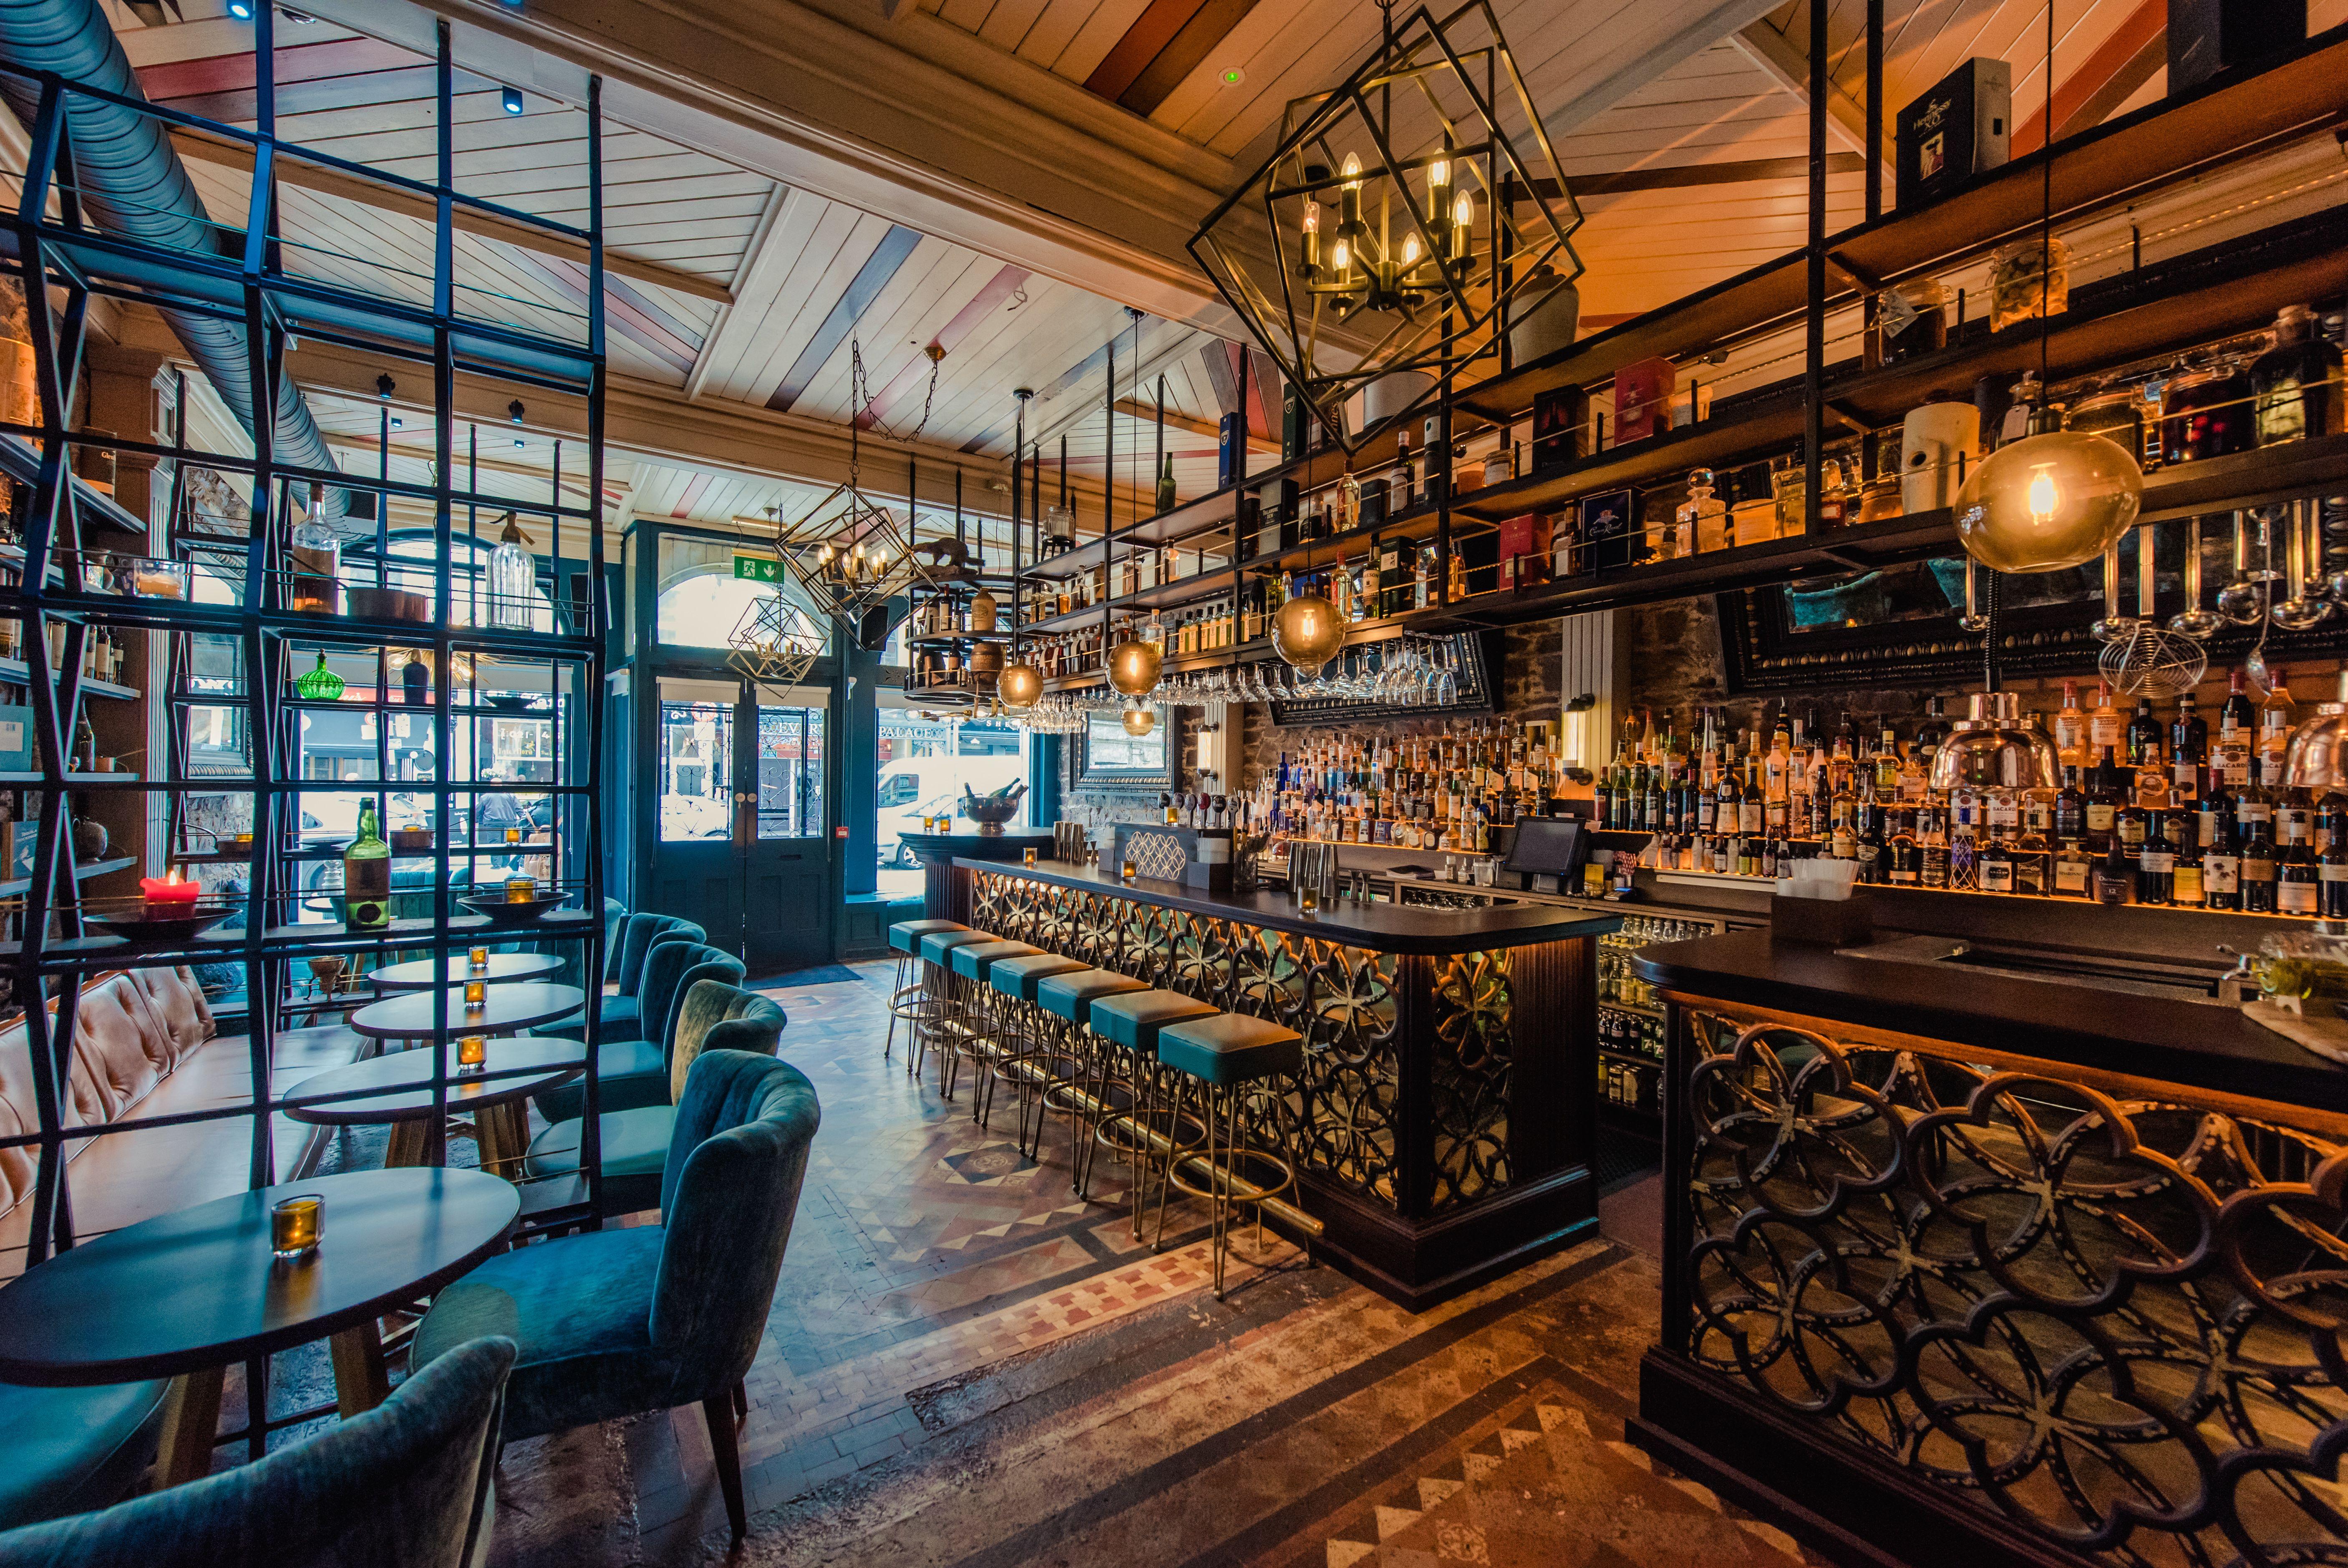 The bar's interior